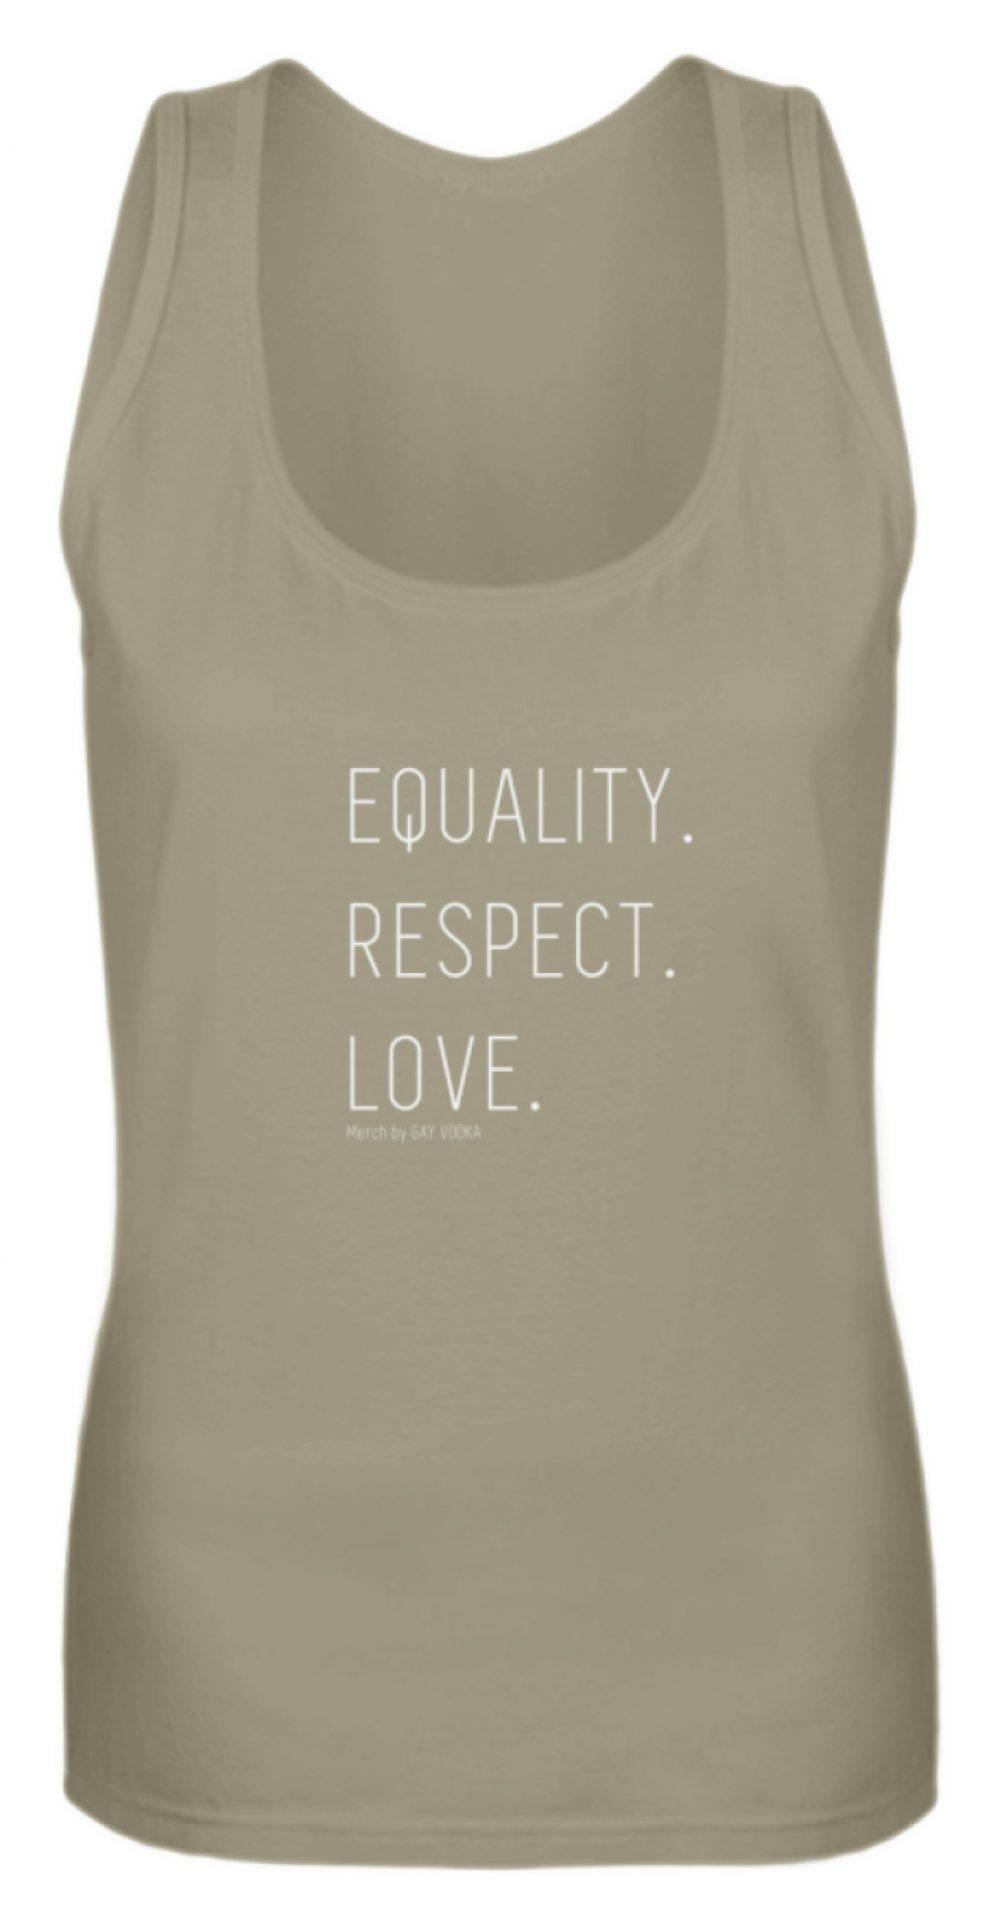 EQUALITY. RESPECT. LOVE. - Frauen Tanktop-651